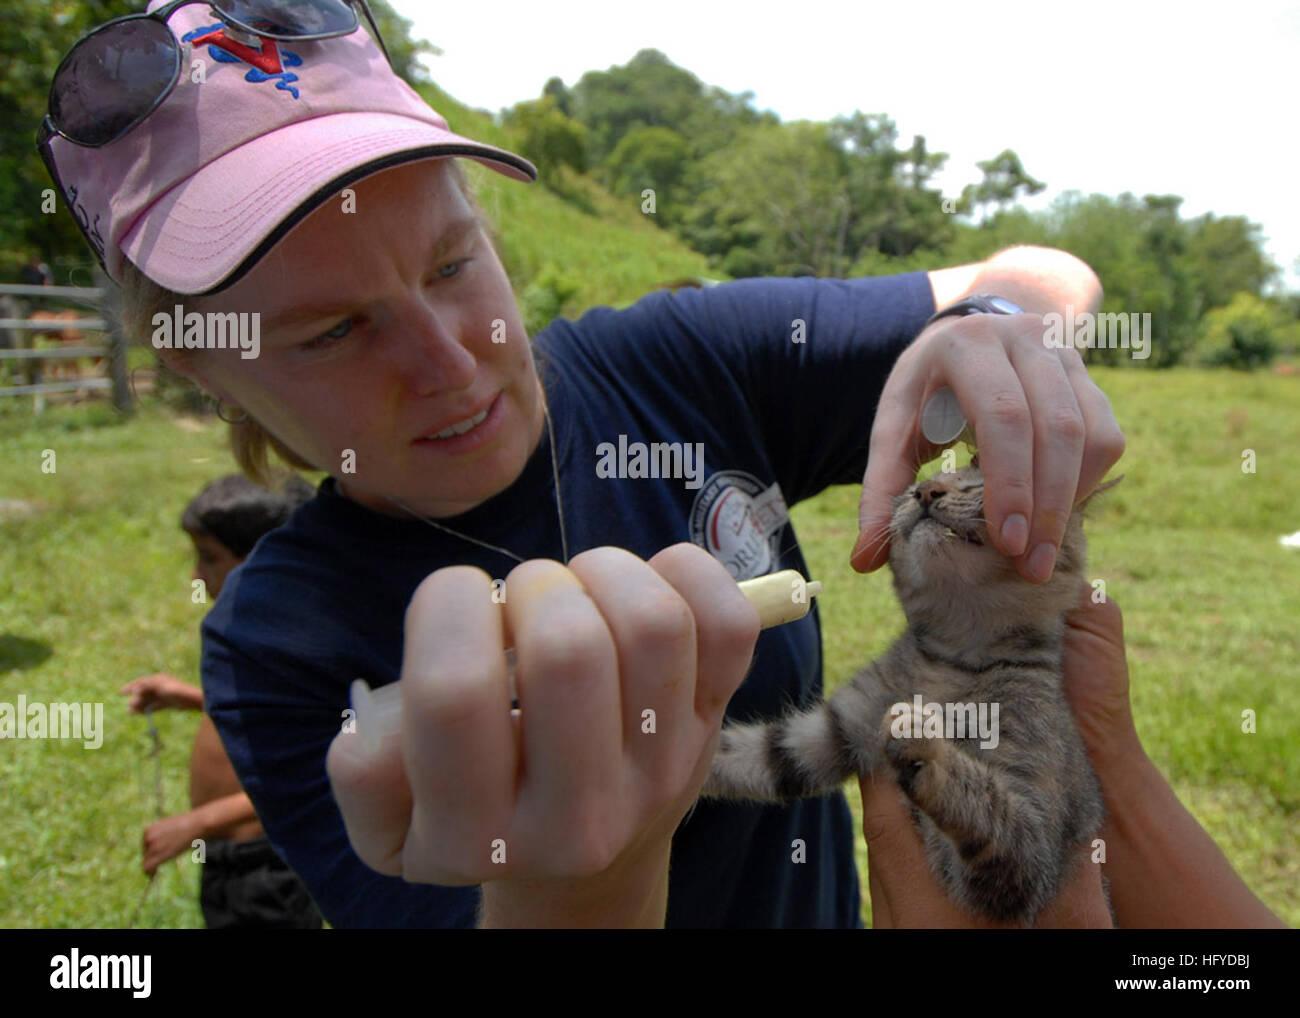 100908-N-7680E-211 PUERTO SANTO TOMAS, Guatemala (Sept. 8, 2010) Elsa Swenson, a veterinarian with the non-governmental - Stock Image